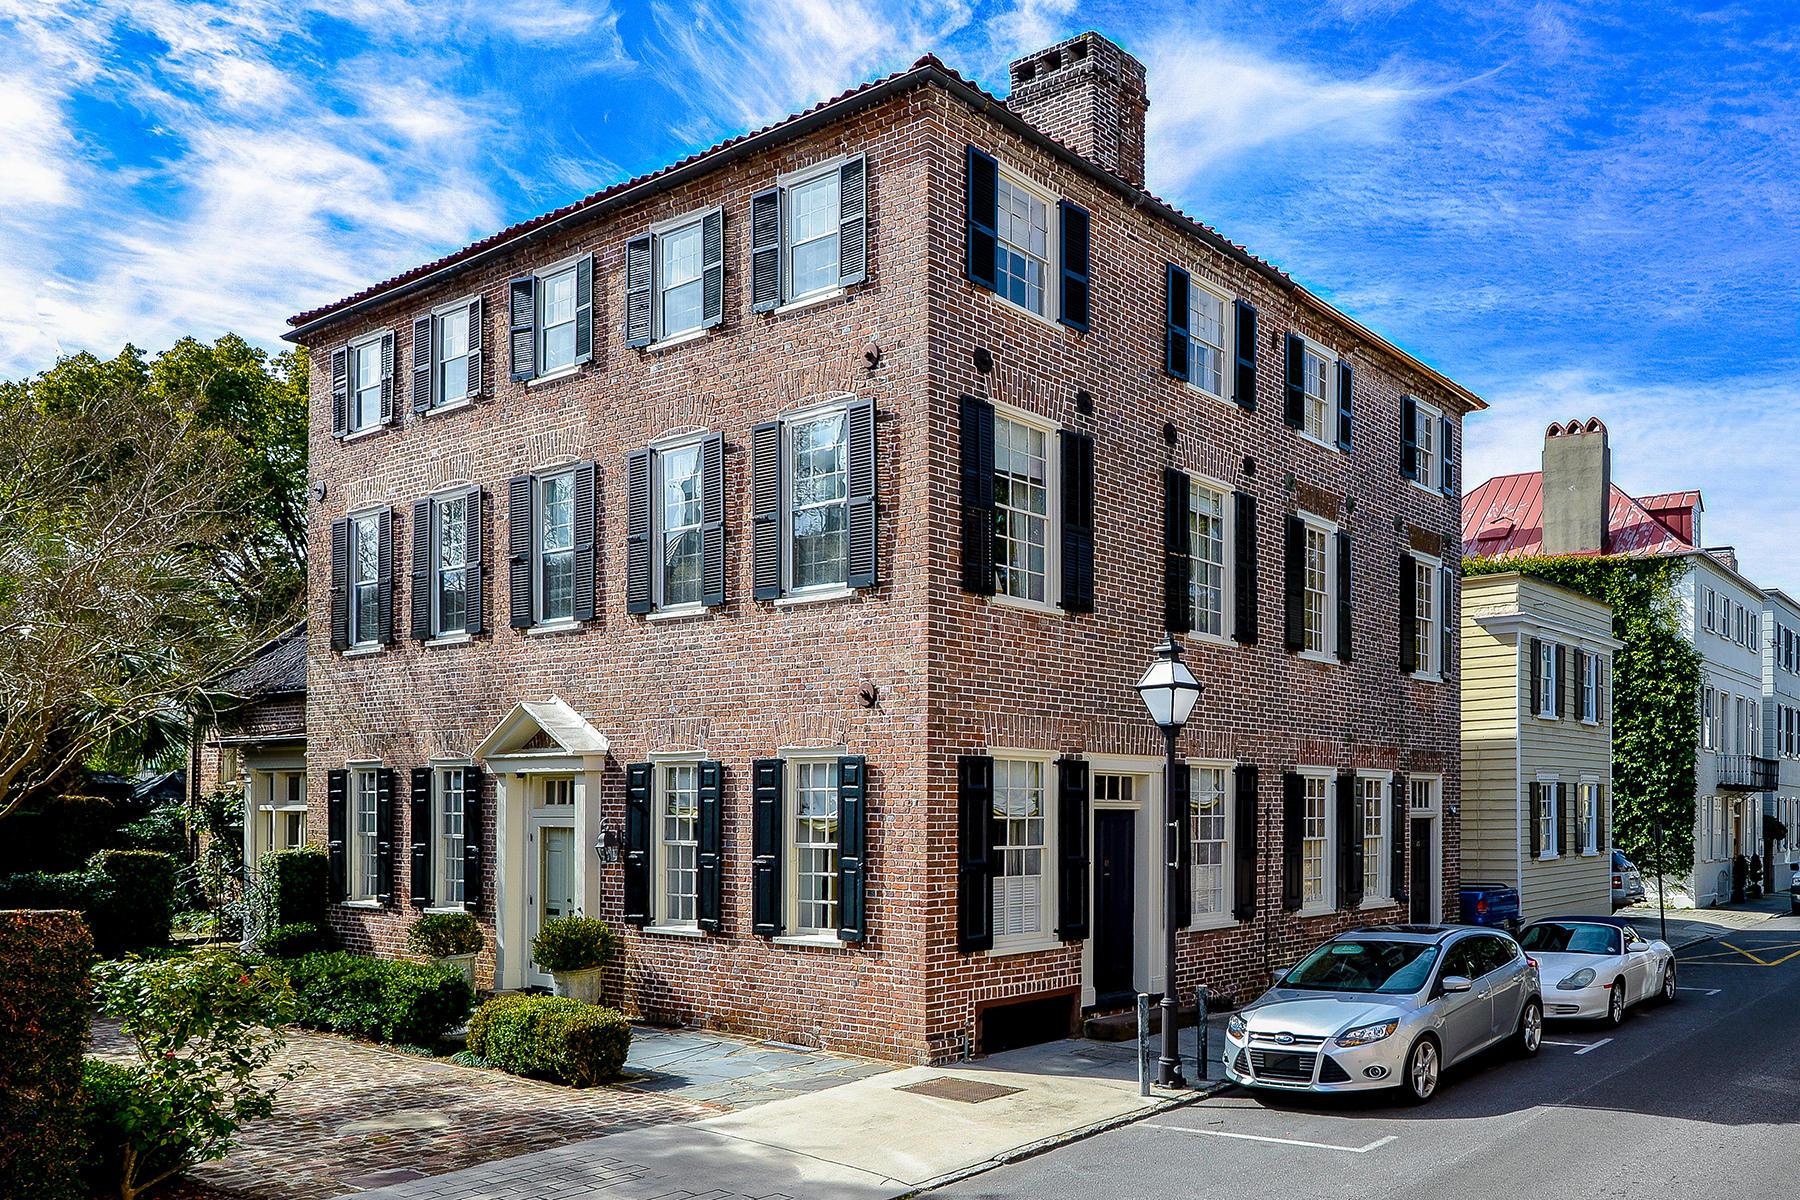 Photo of 41 Tradd St, Charleston, SC 29401